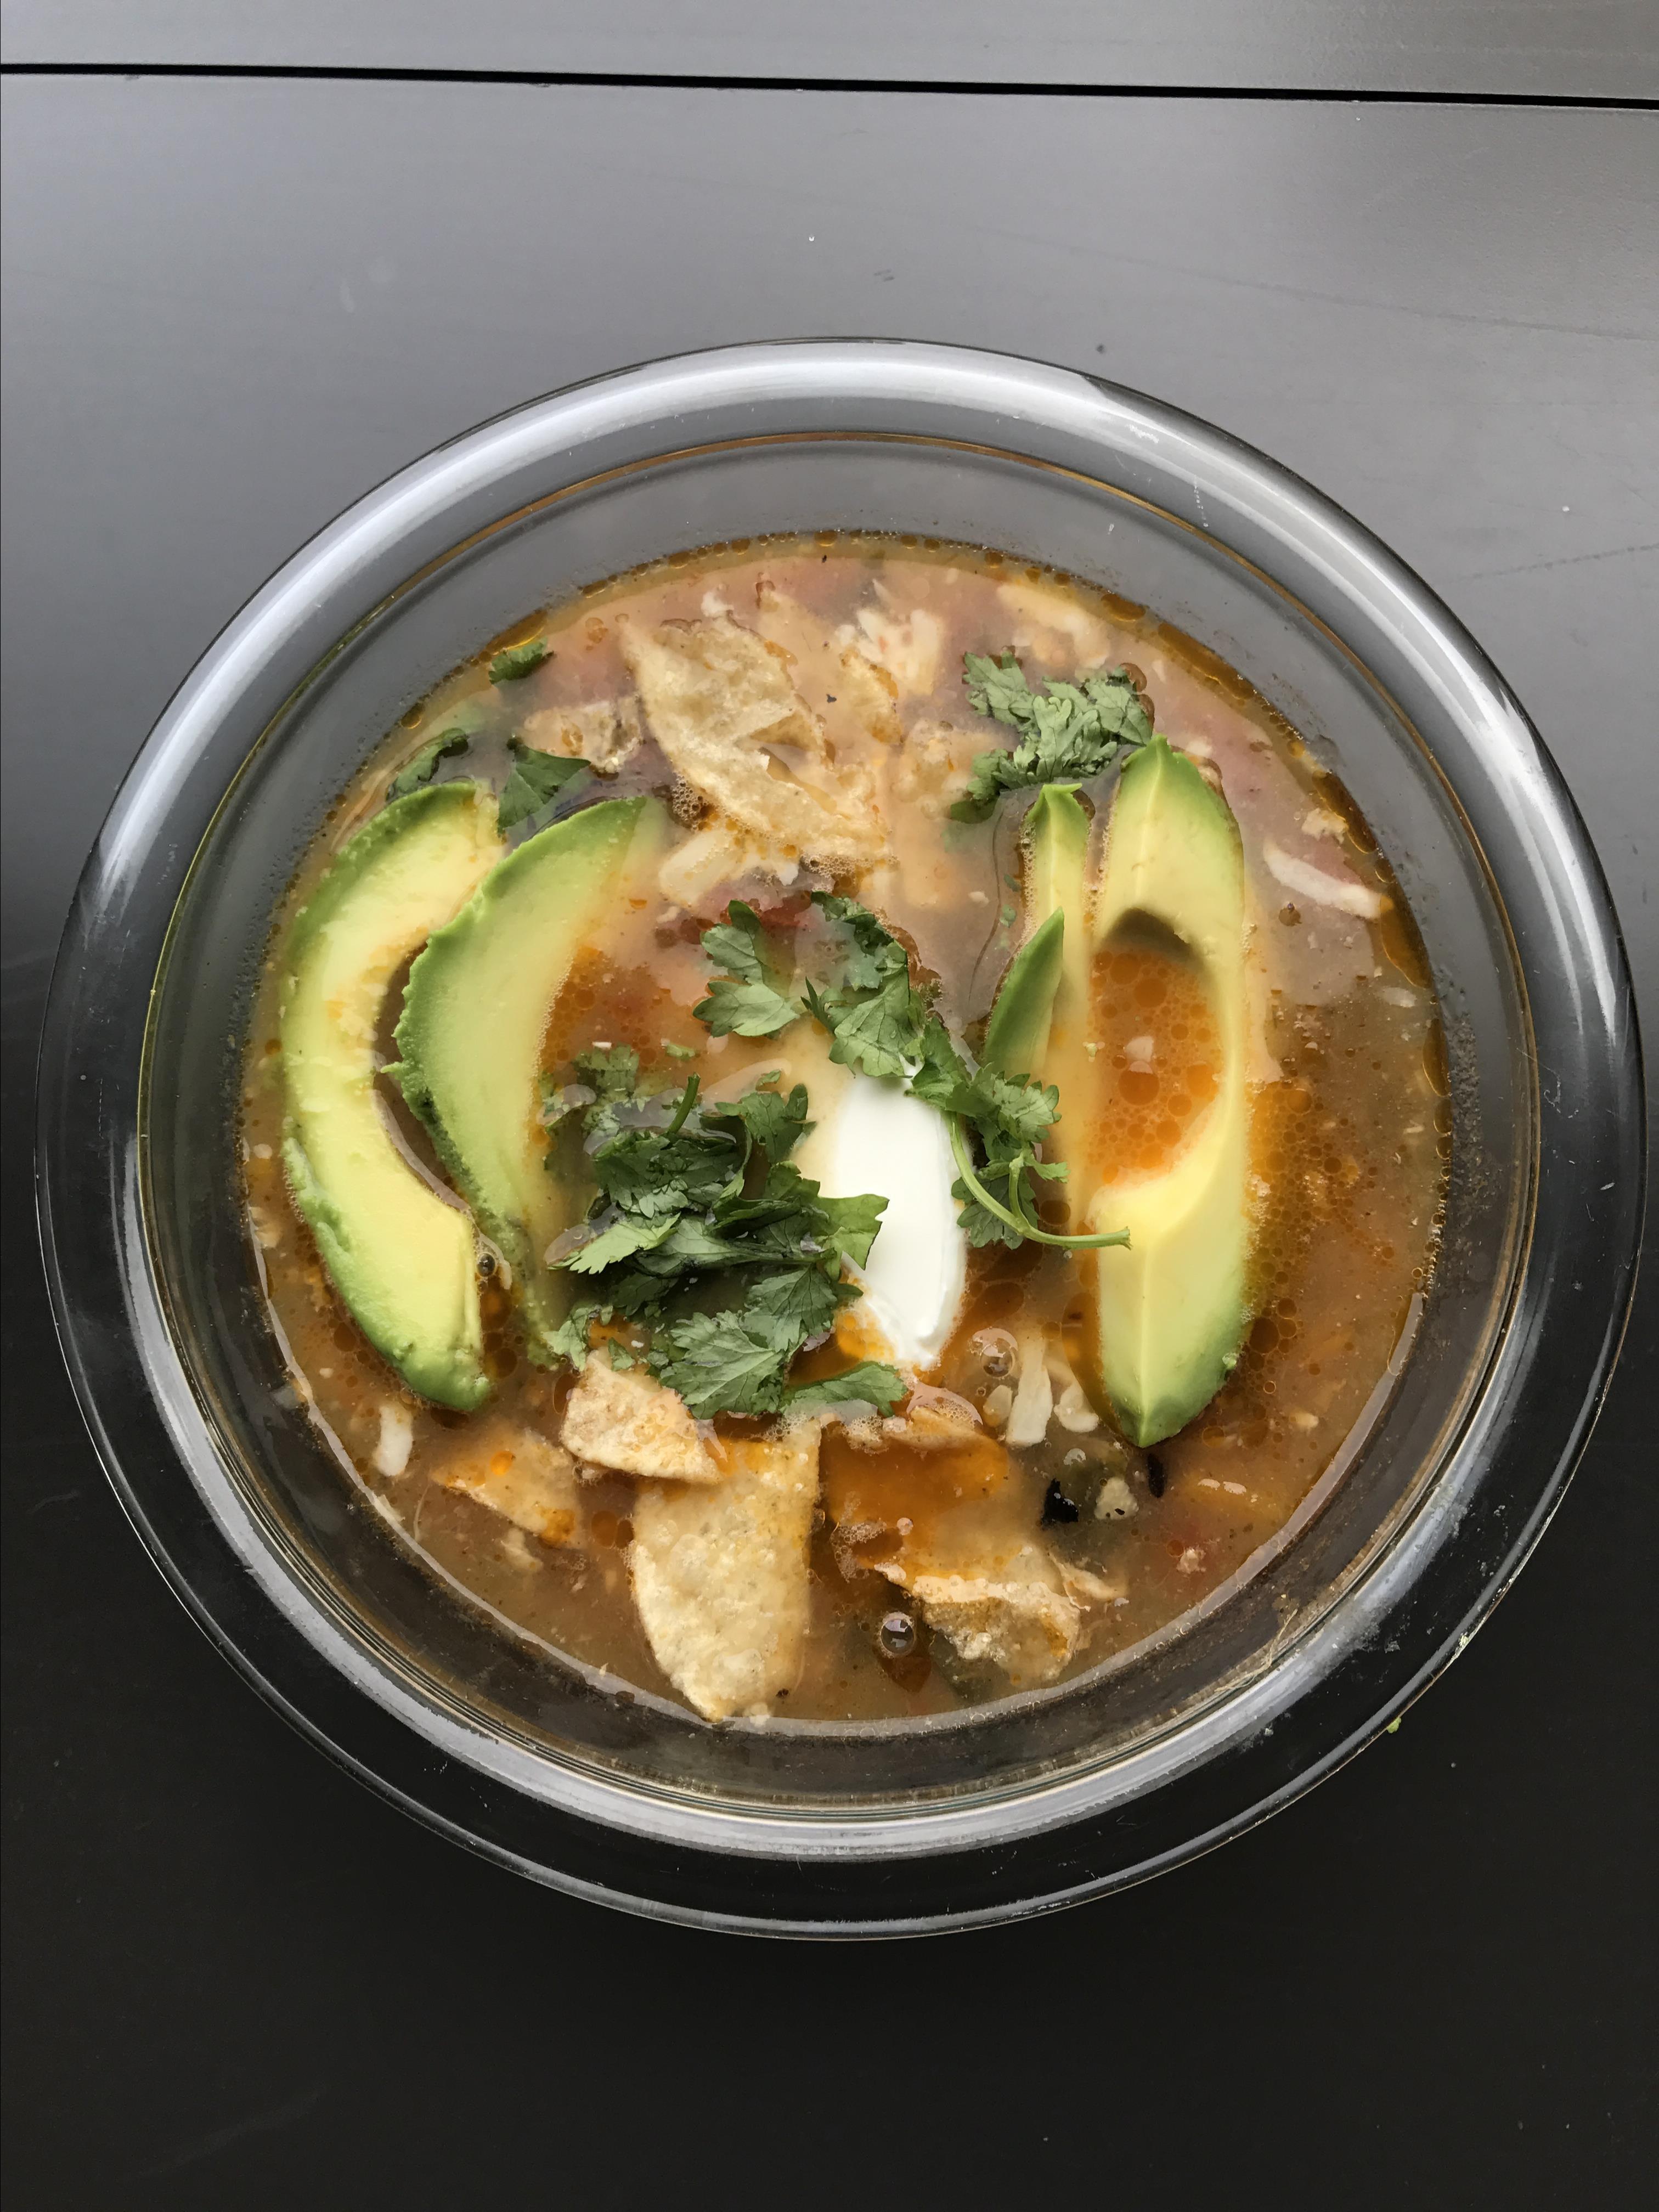 Instant Pot® Chicken Tortilla Soup voraciousgirl